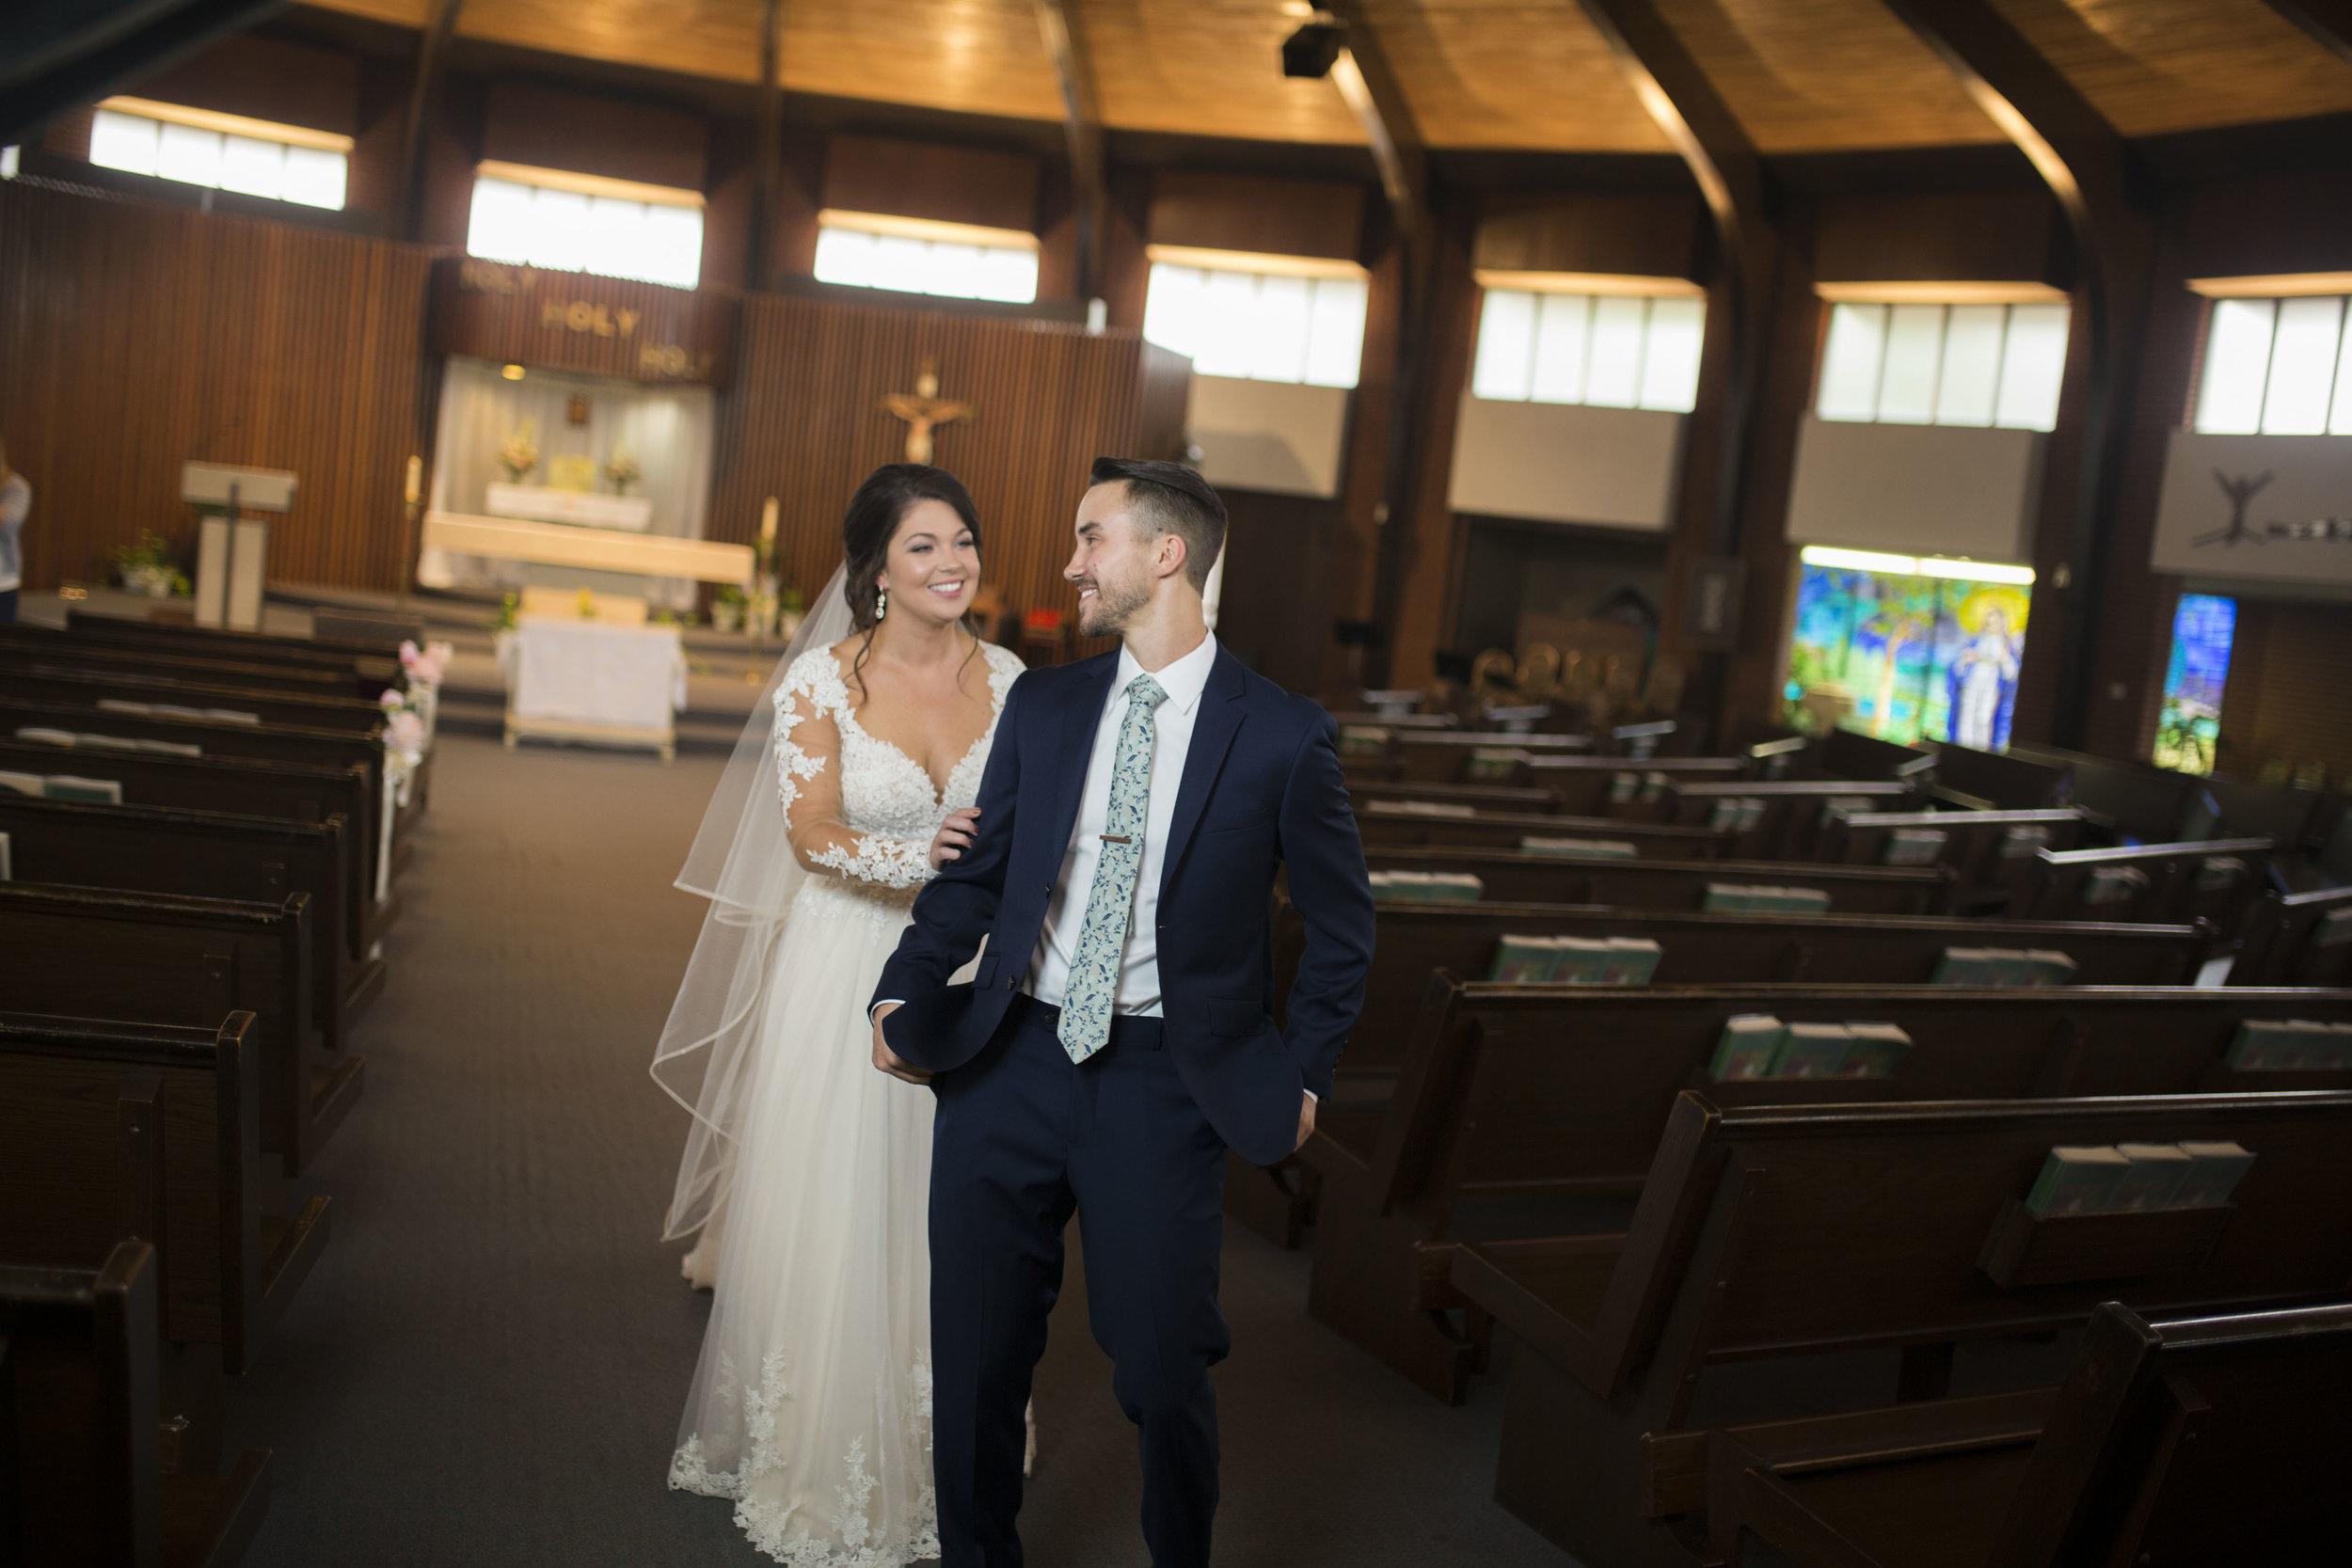 Nosbisch Wedding 5D 171.jpg